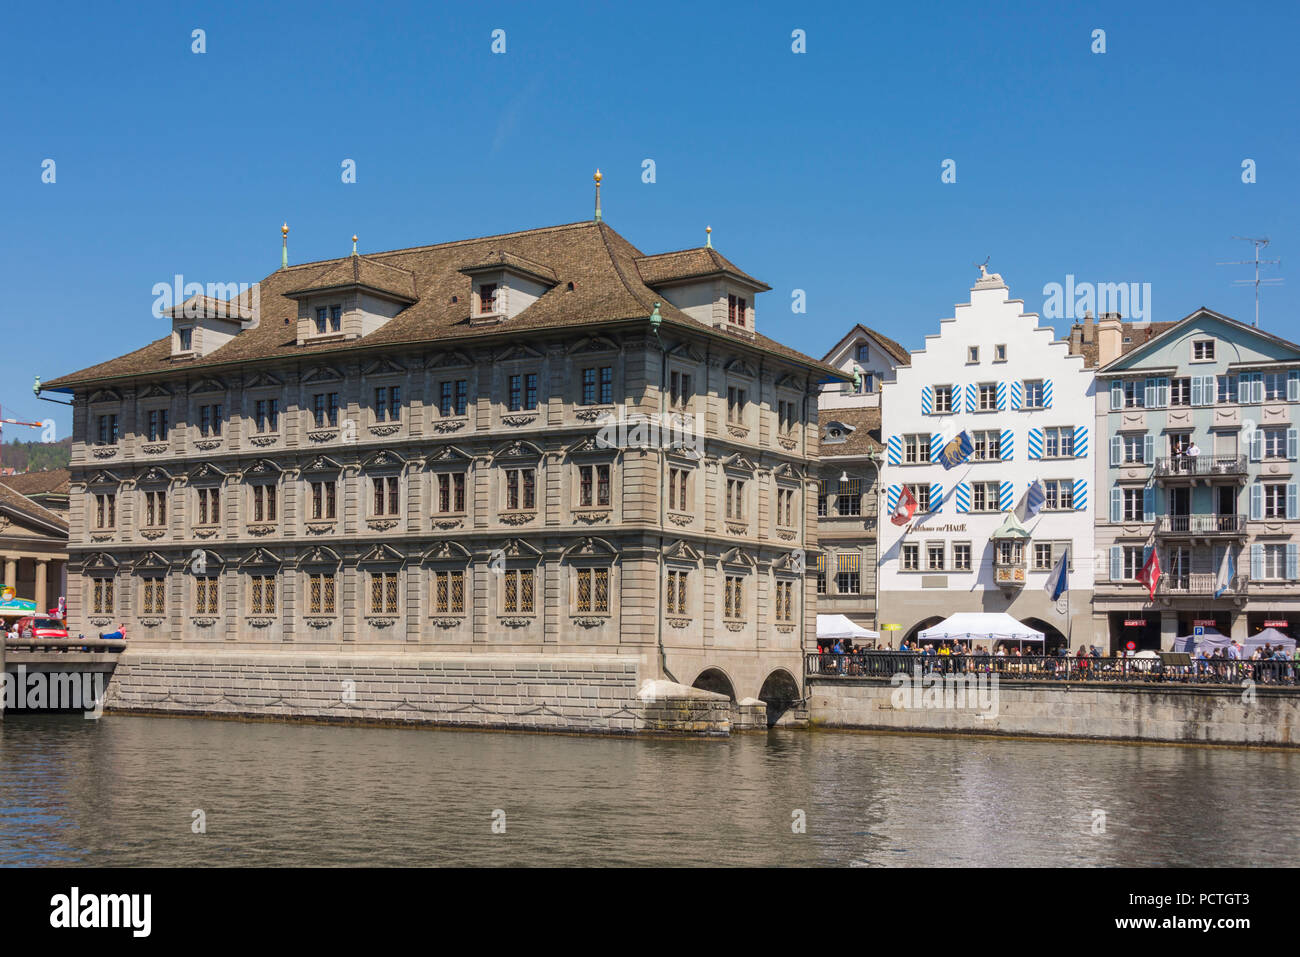 Limmatquai with Town Hall, old town, Zurich, Canton of Zurich, Switzerland - Stock Image